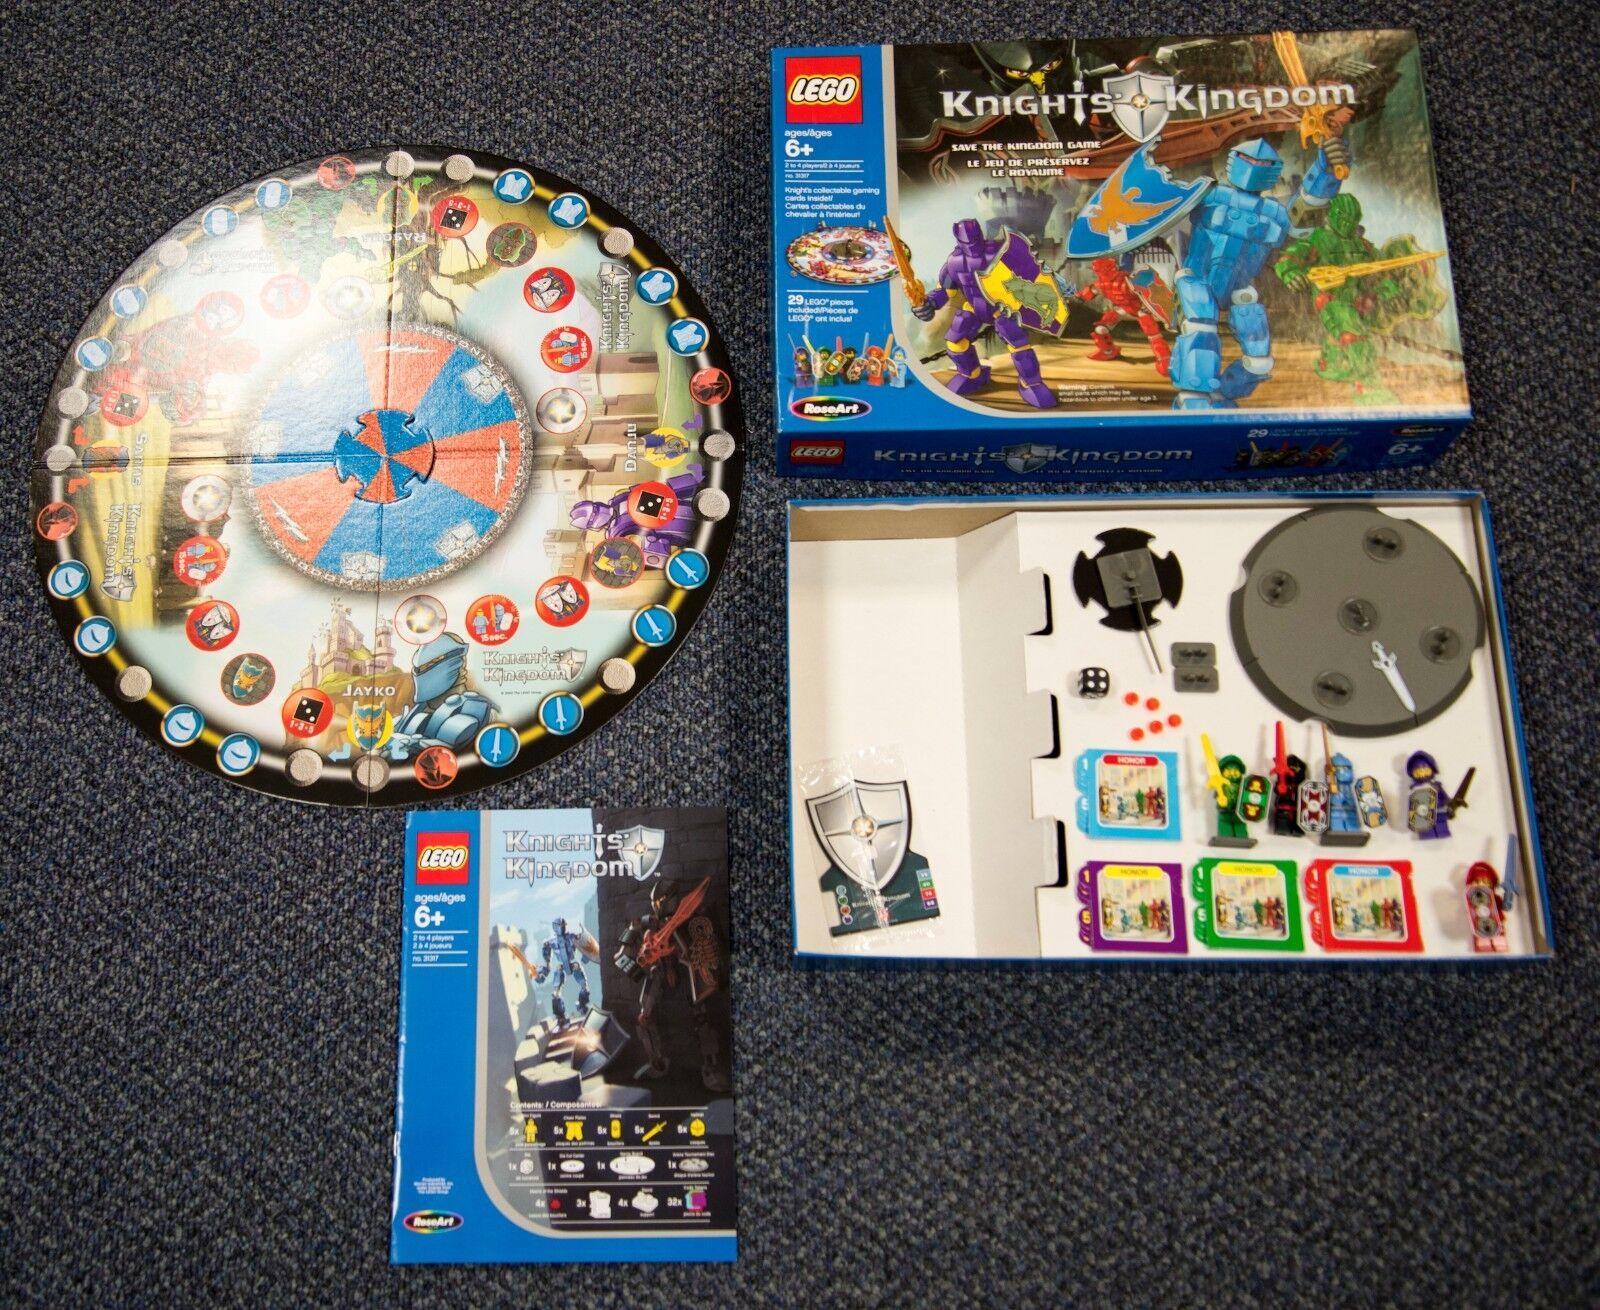 2004 LEGO KNIGHT'S KINGDOM BOARD BOARD BOARD GAME & FIGURES RosaART a2c3c5